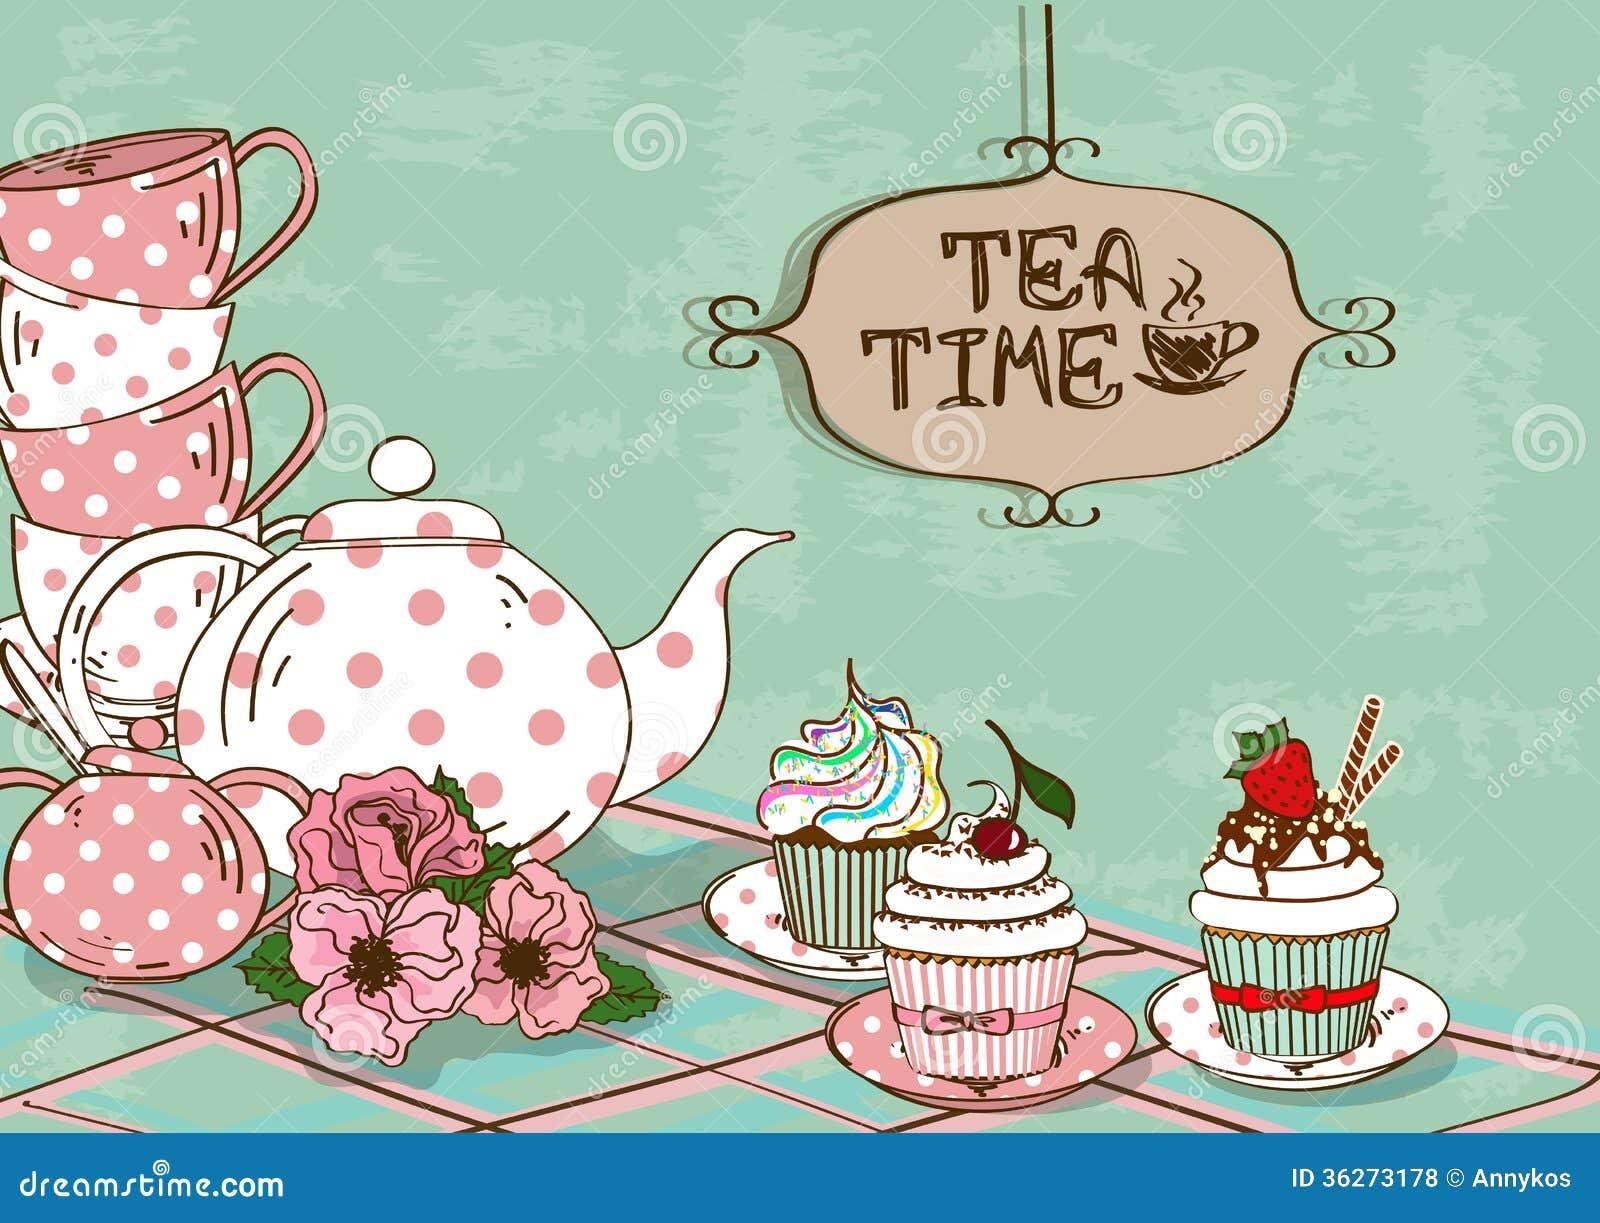 Animal Coffee Mugs Illustration With Still Life Of Tea Set And Cupcakes